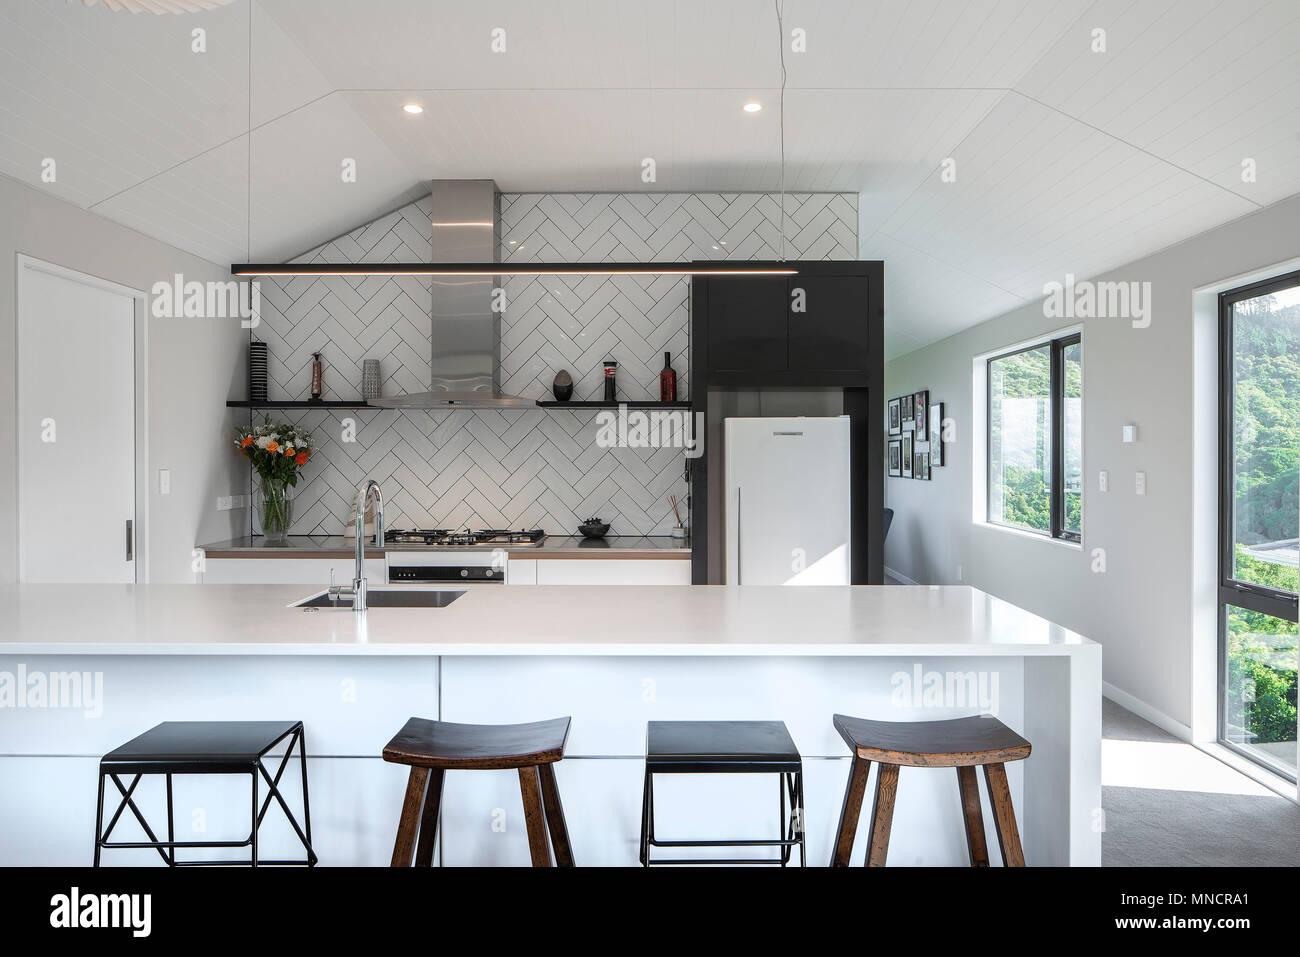 Beste Küche Barhocker Neuseeland Ideen - Küchenschrank Ideen ...